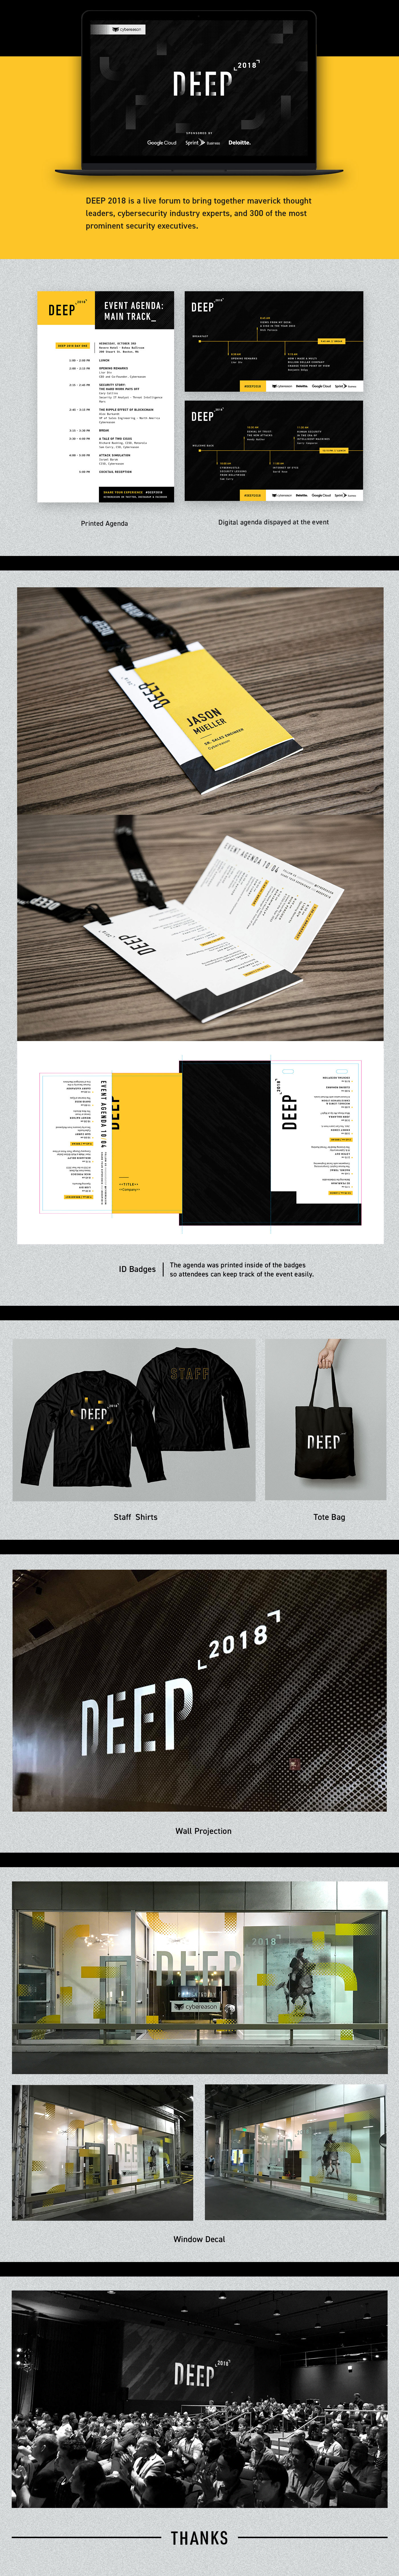 Branding Graphic Design